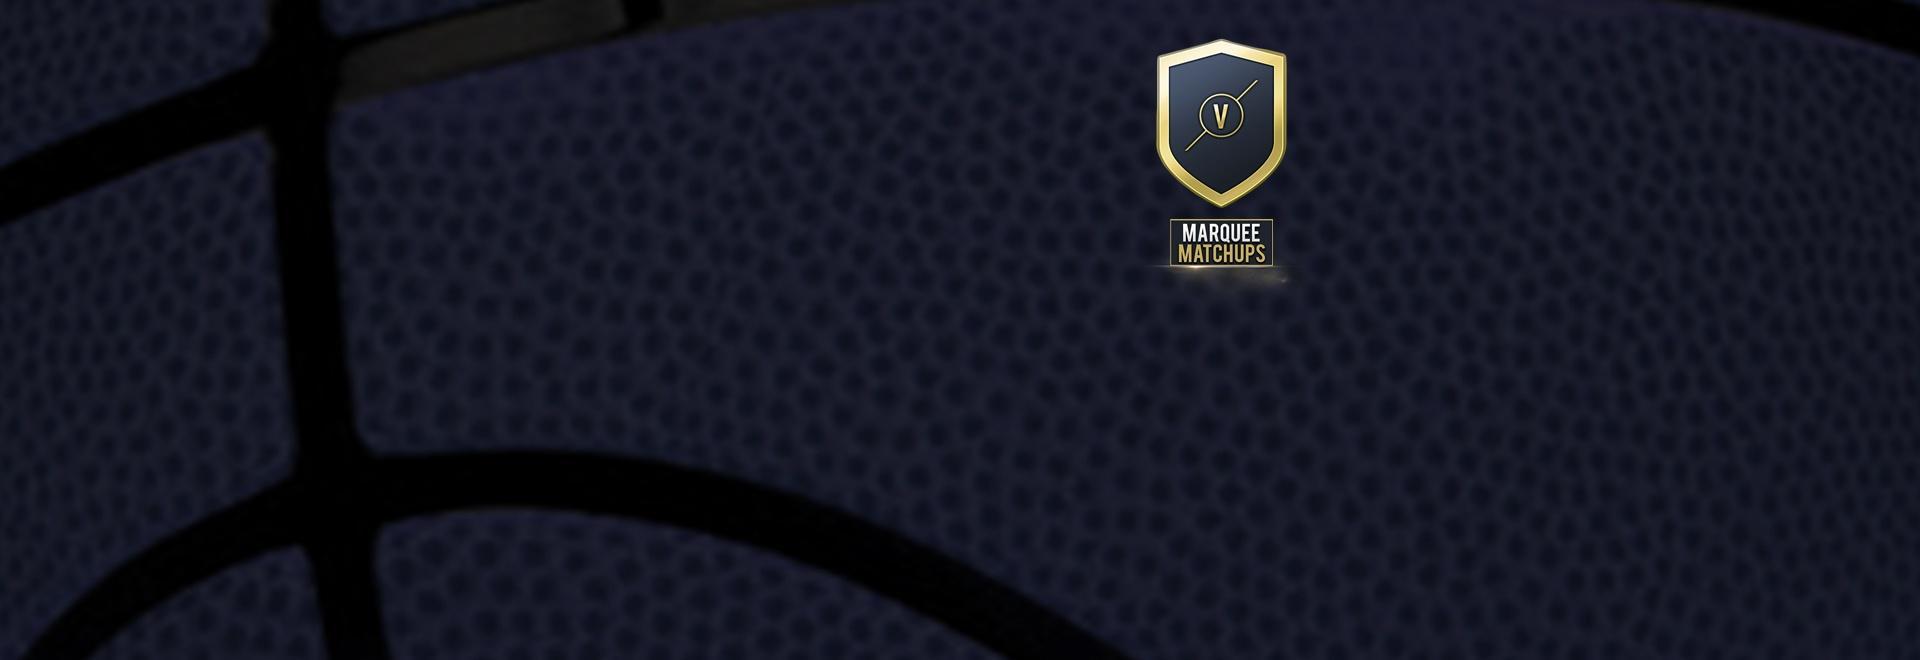 Warriors - Mavericks